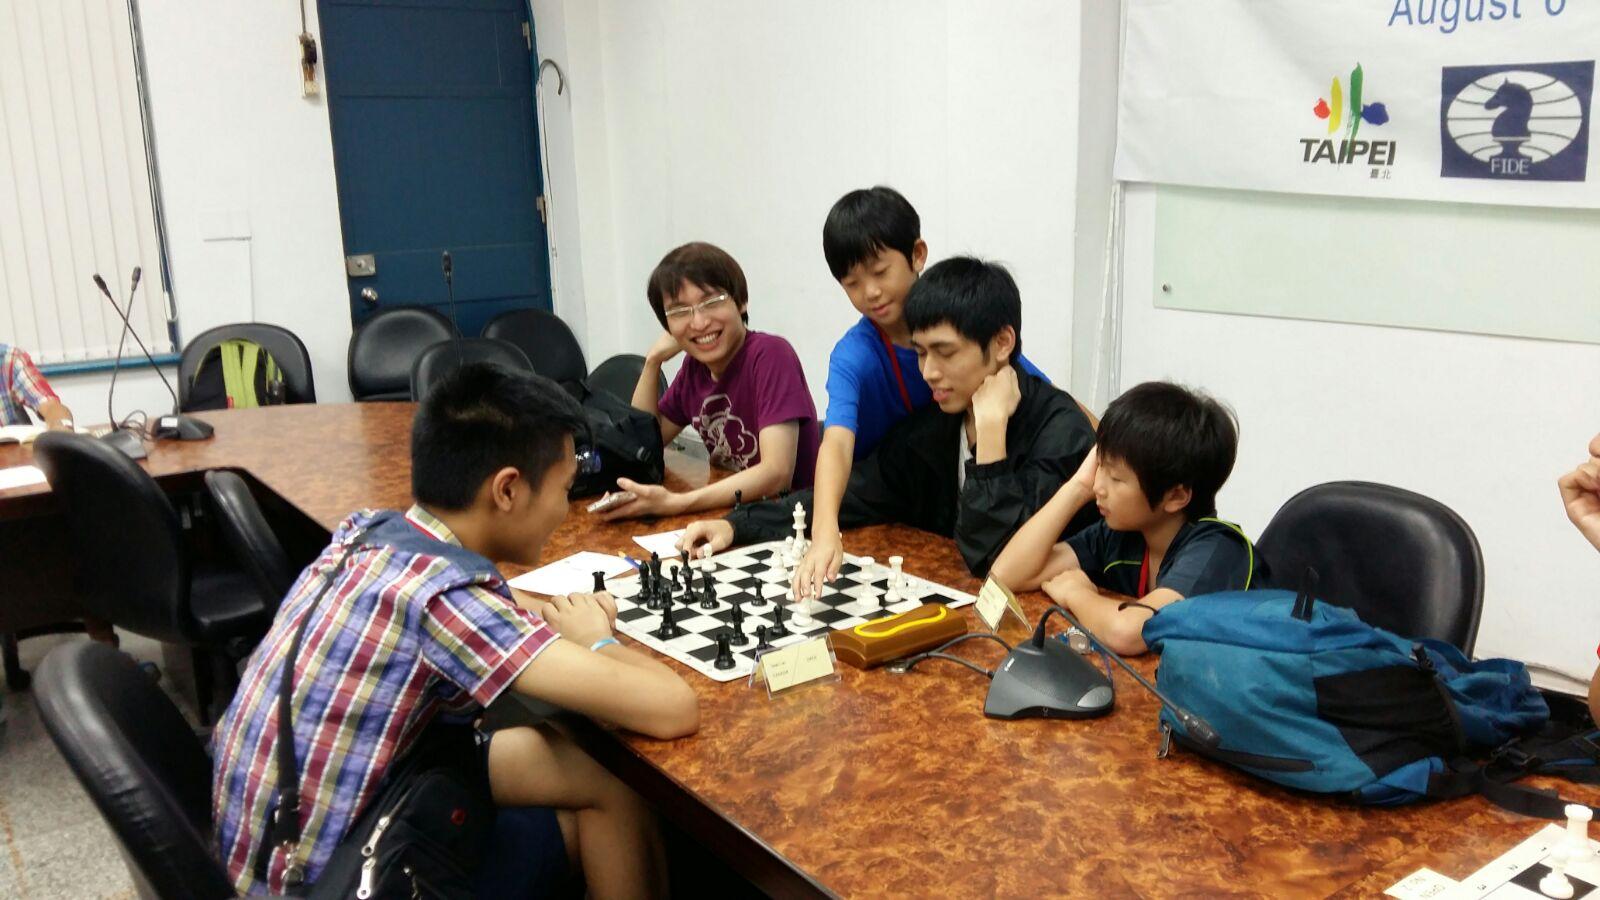 enjoying a game of chess